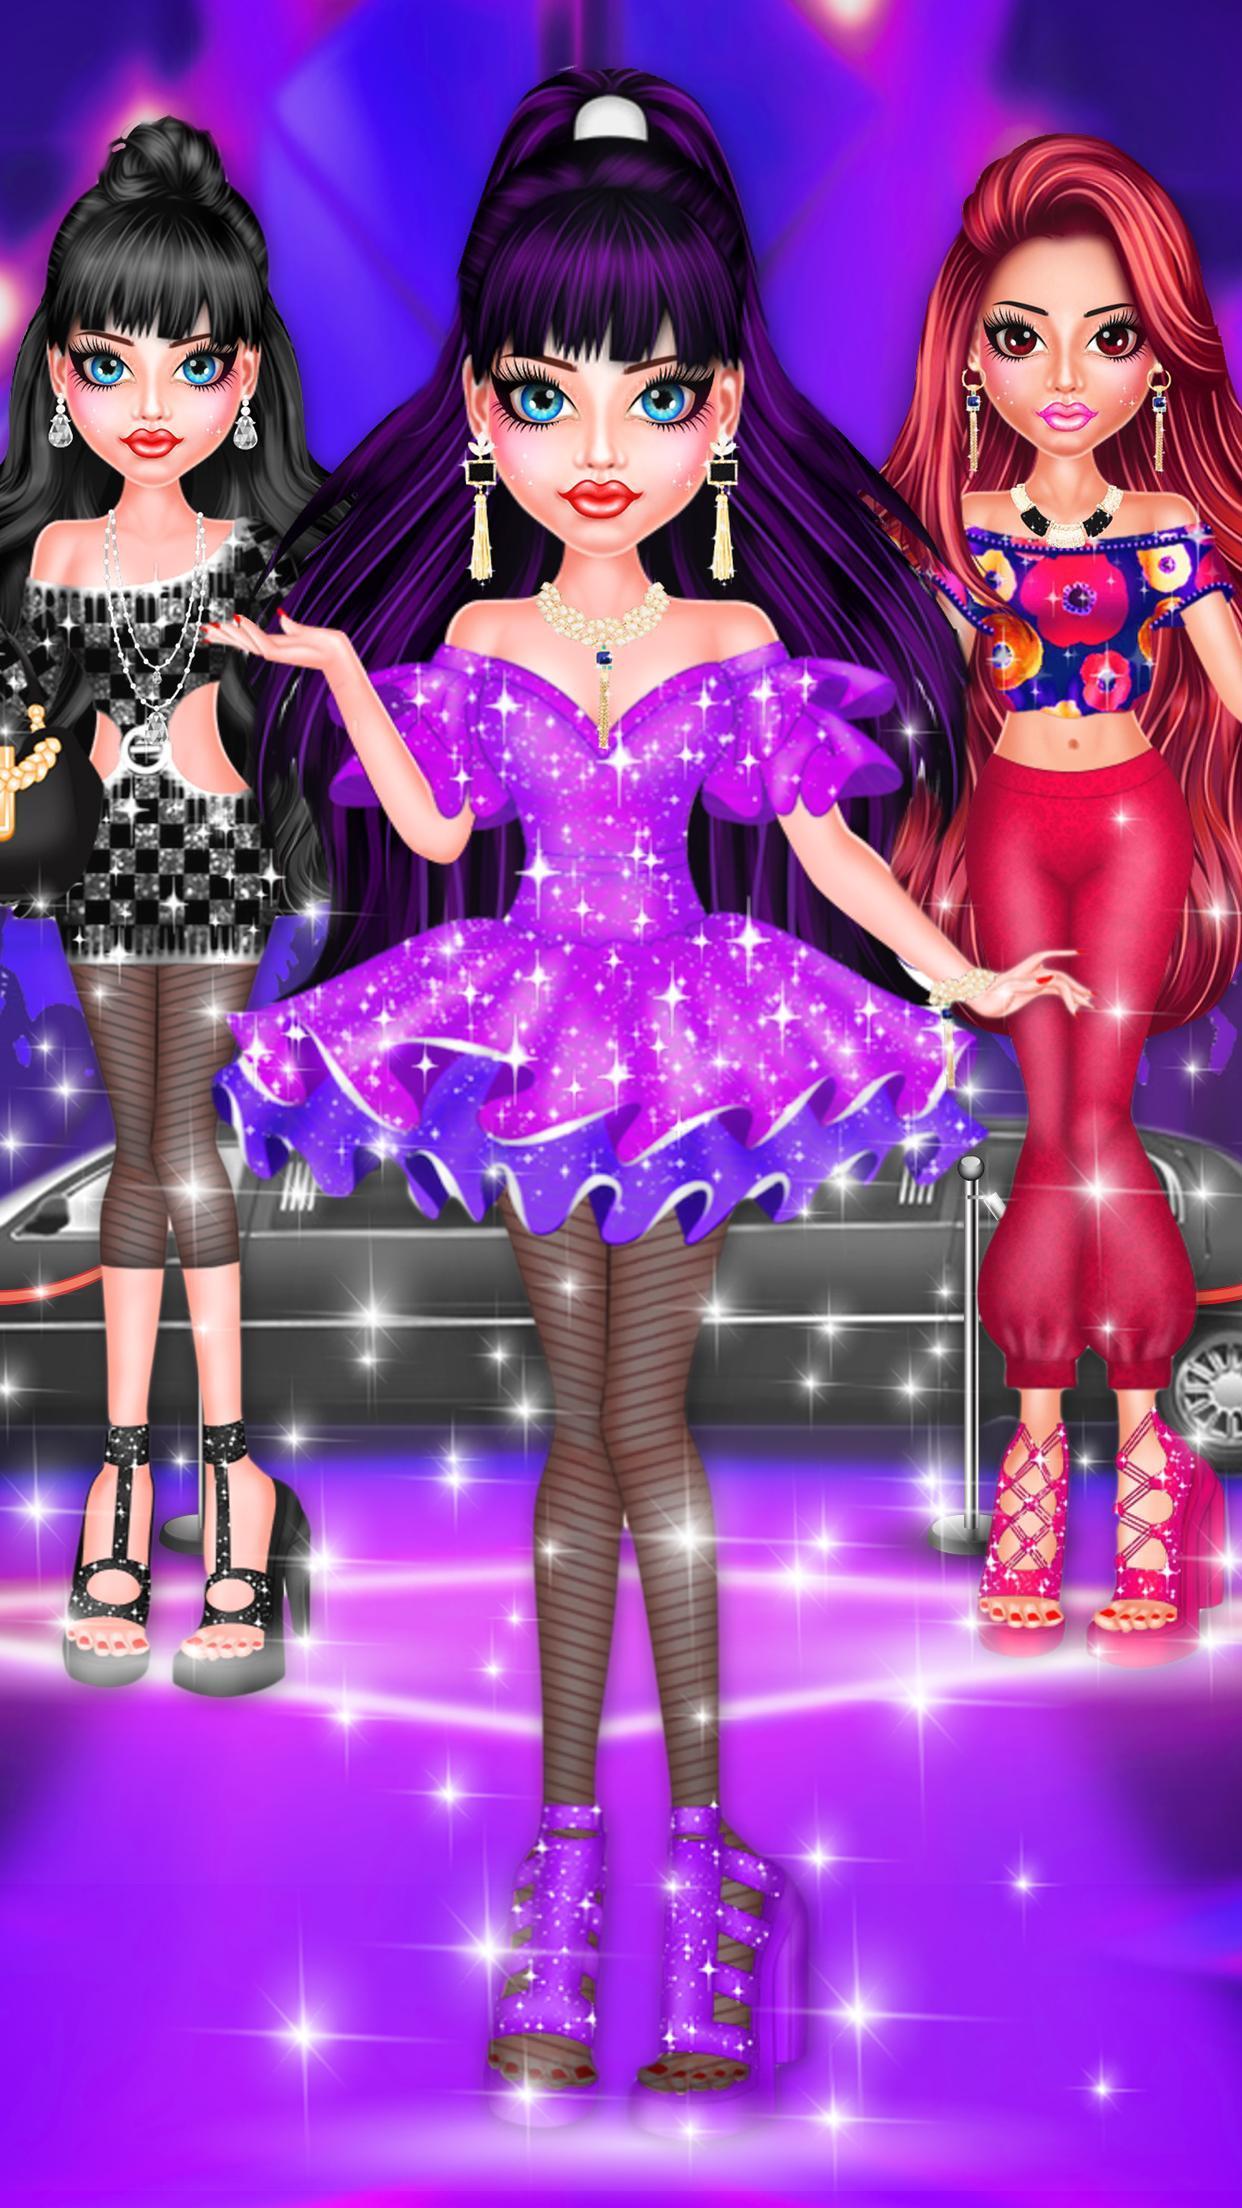 BFF Dolls : Beauty Contest Fashion Salon makeover 2.1 Screenshot 5